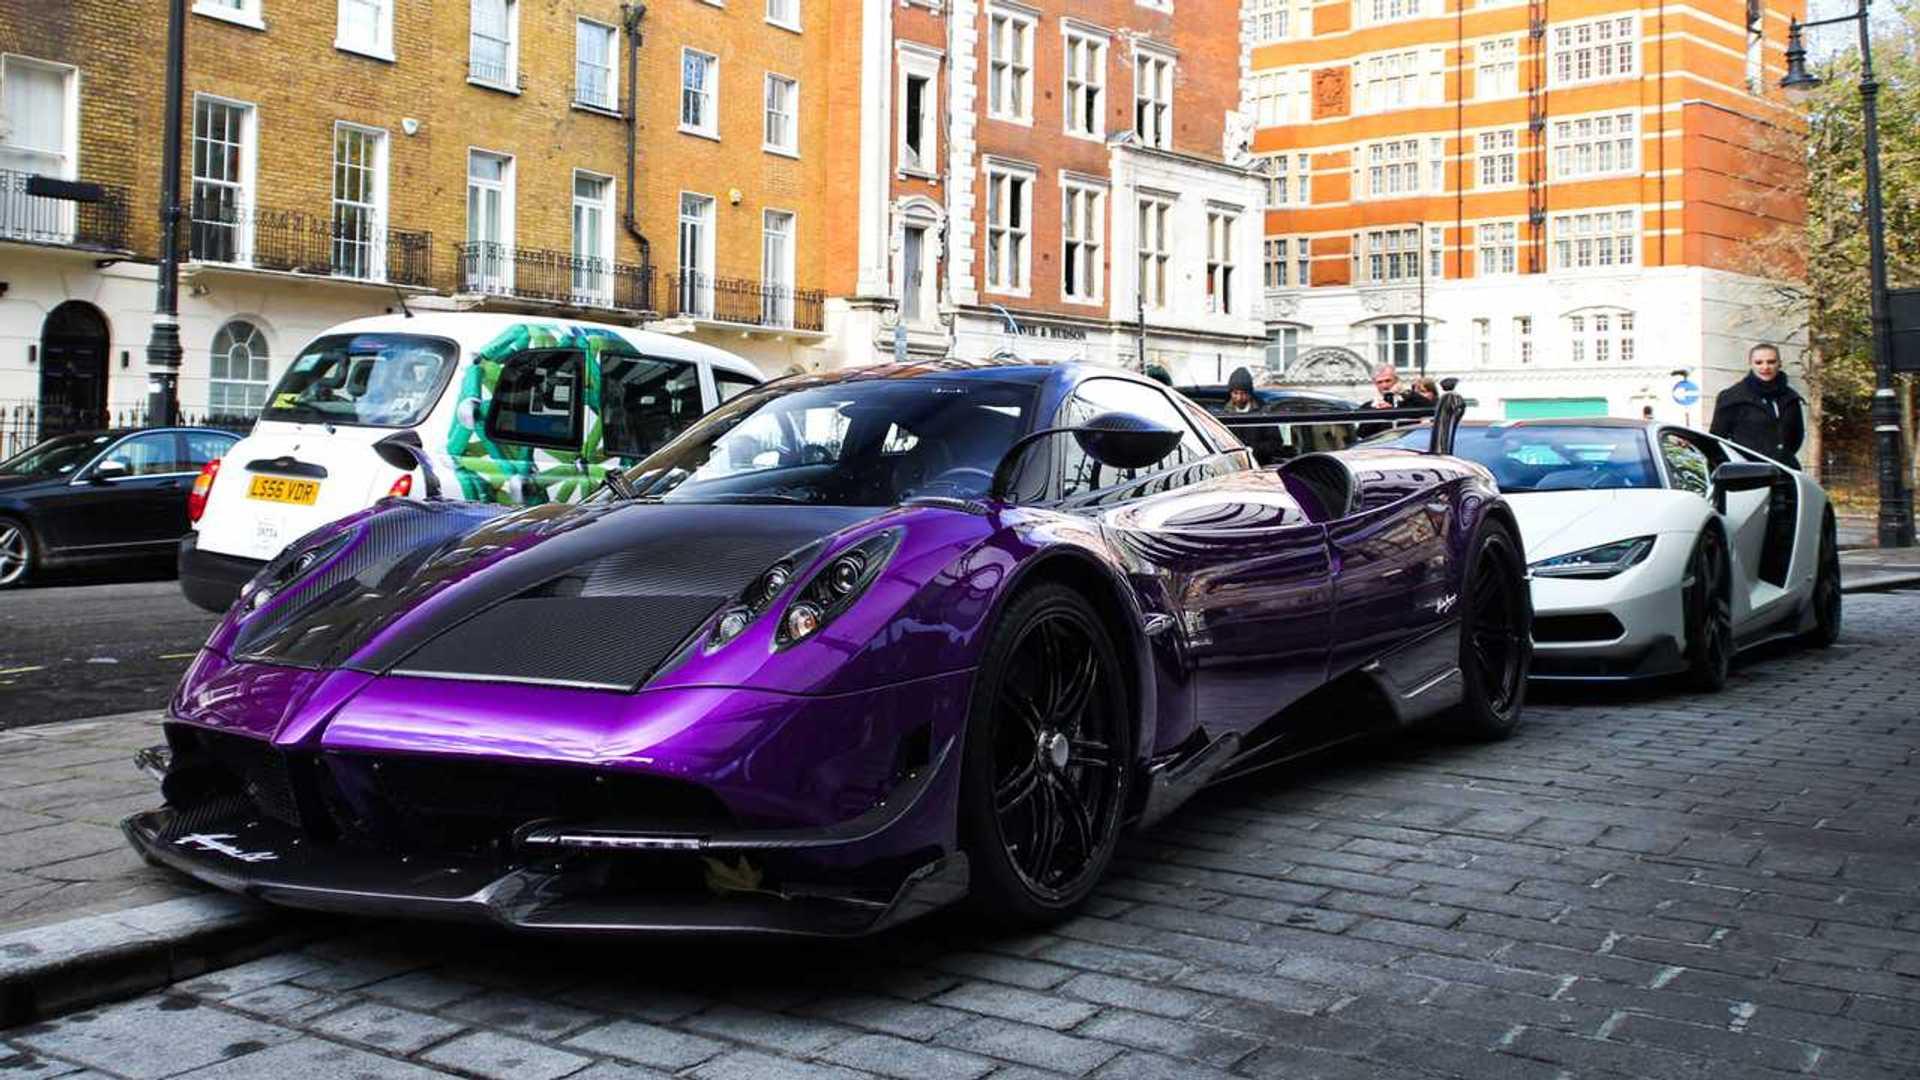 Pagani Huayra Bc And Lamborghini Centenario Parked At Luxury Hotel In London 3404790